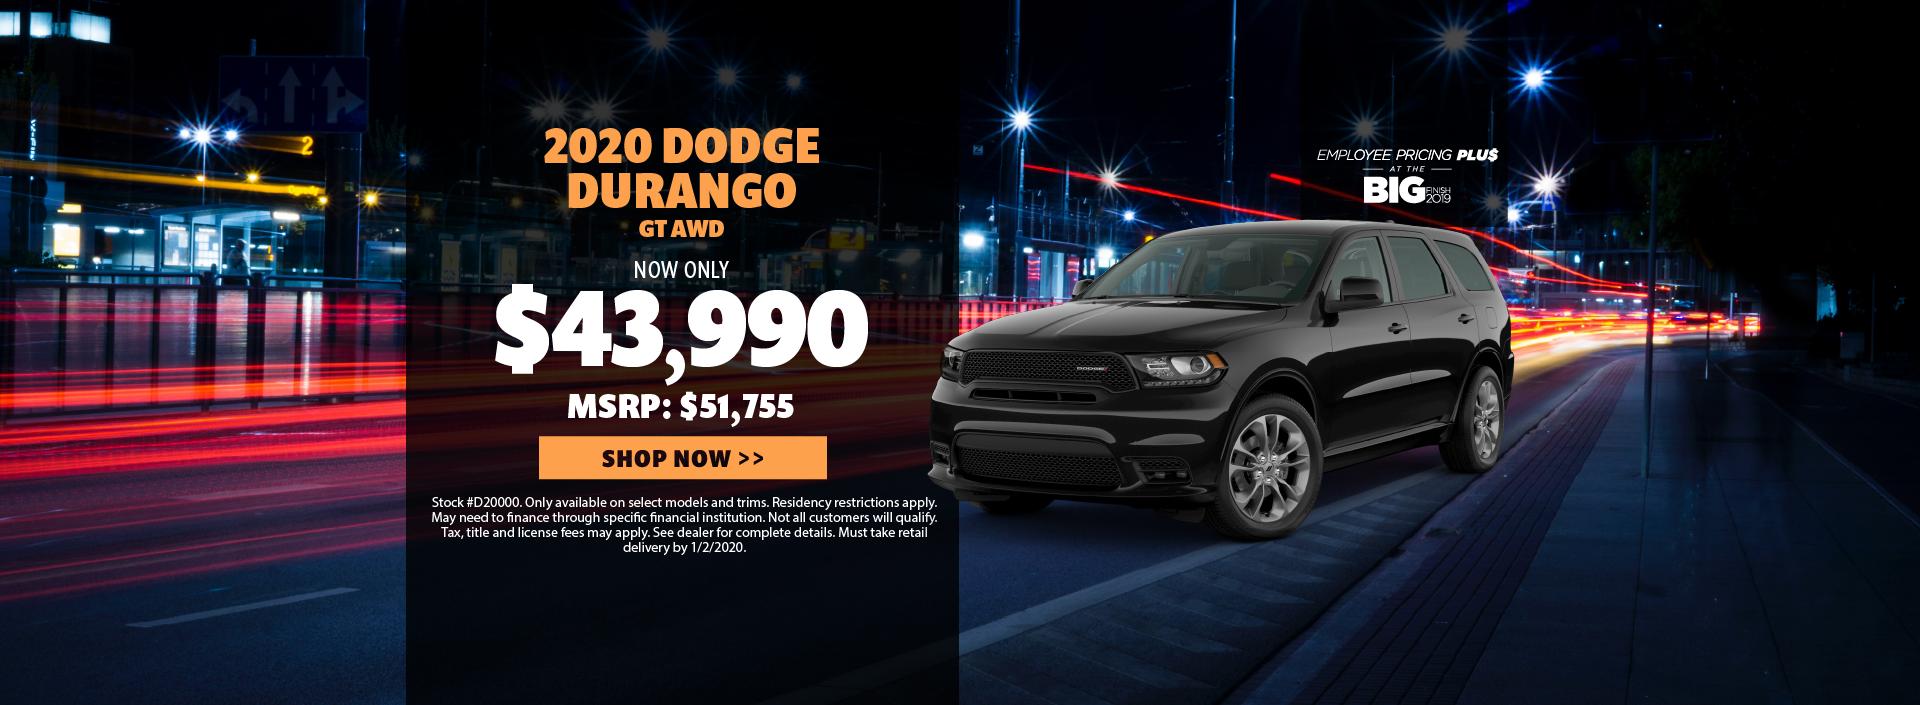 2020 Dodge Durango Offer